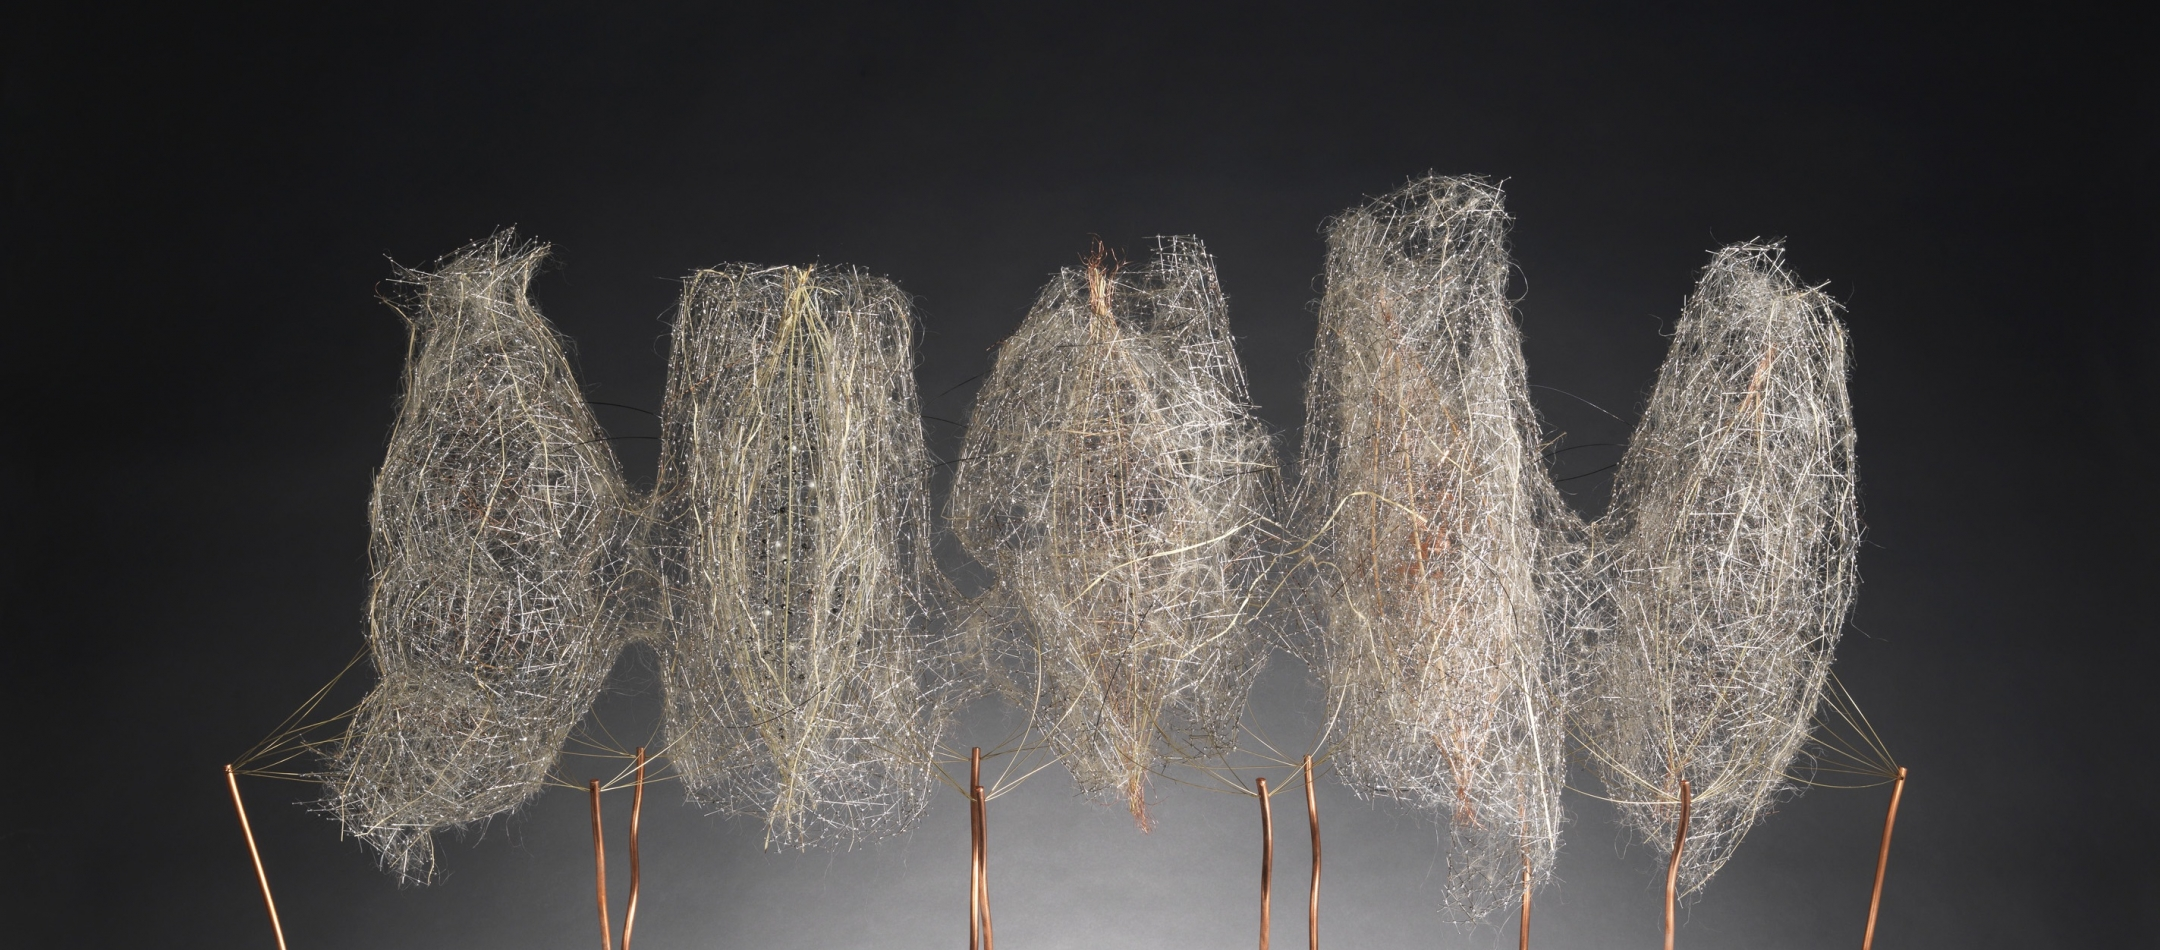 Antonio Crespo Foix - Recent Works